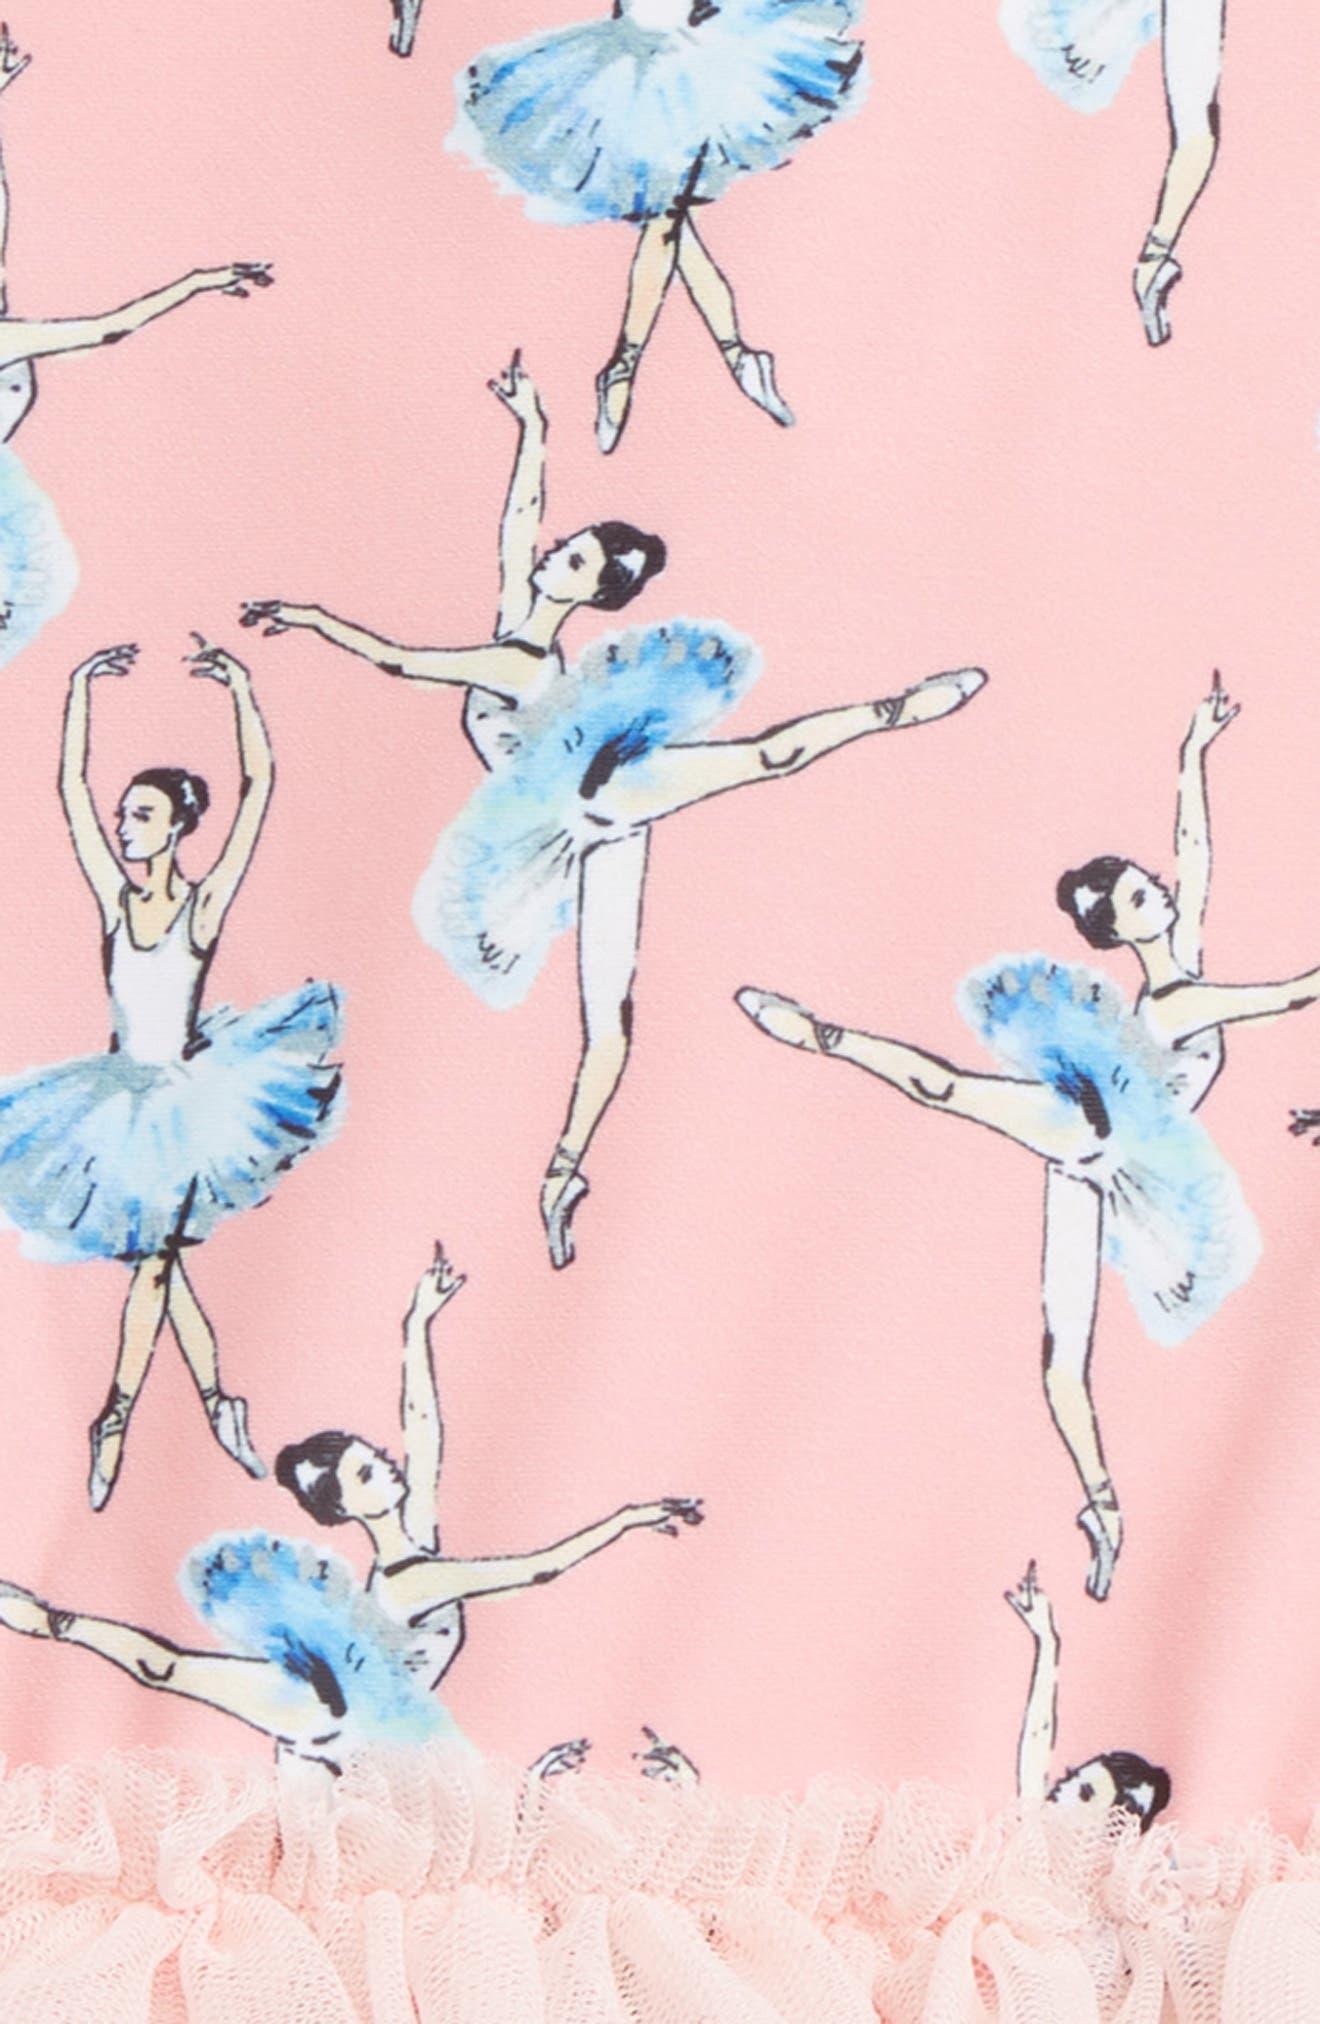 Basque Ballerinas One-Piece Swimsuit,                             Alternate thumbnail 2, color,                             Pink